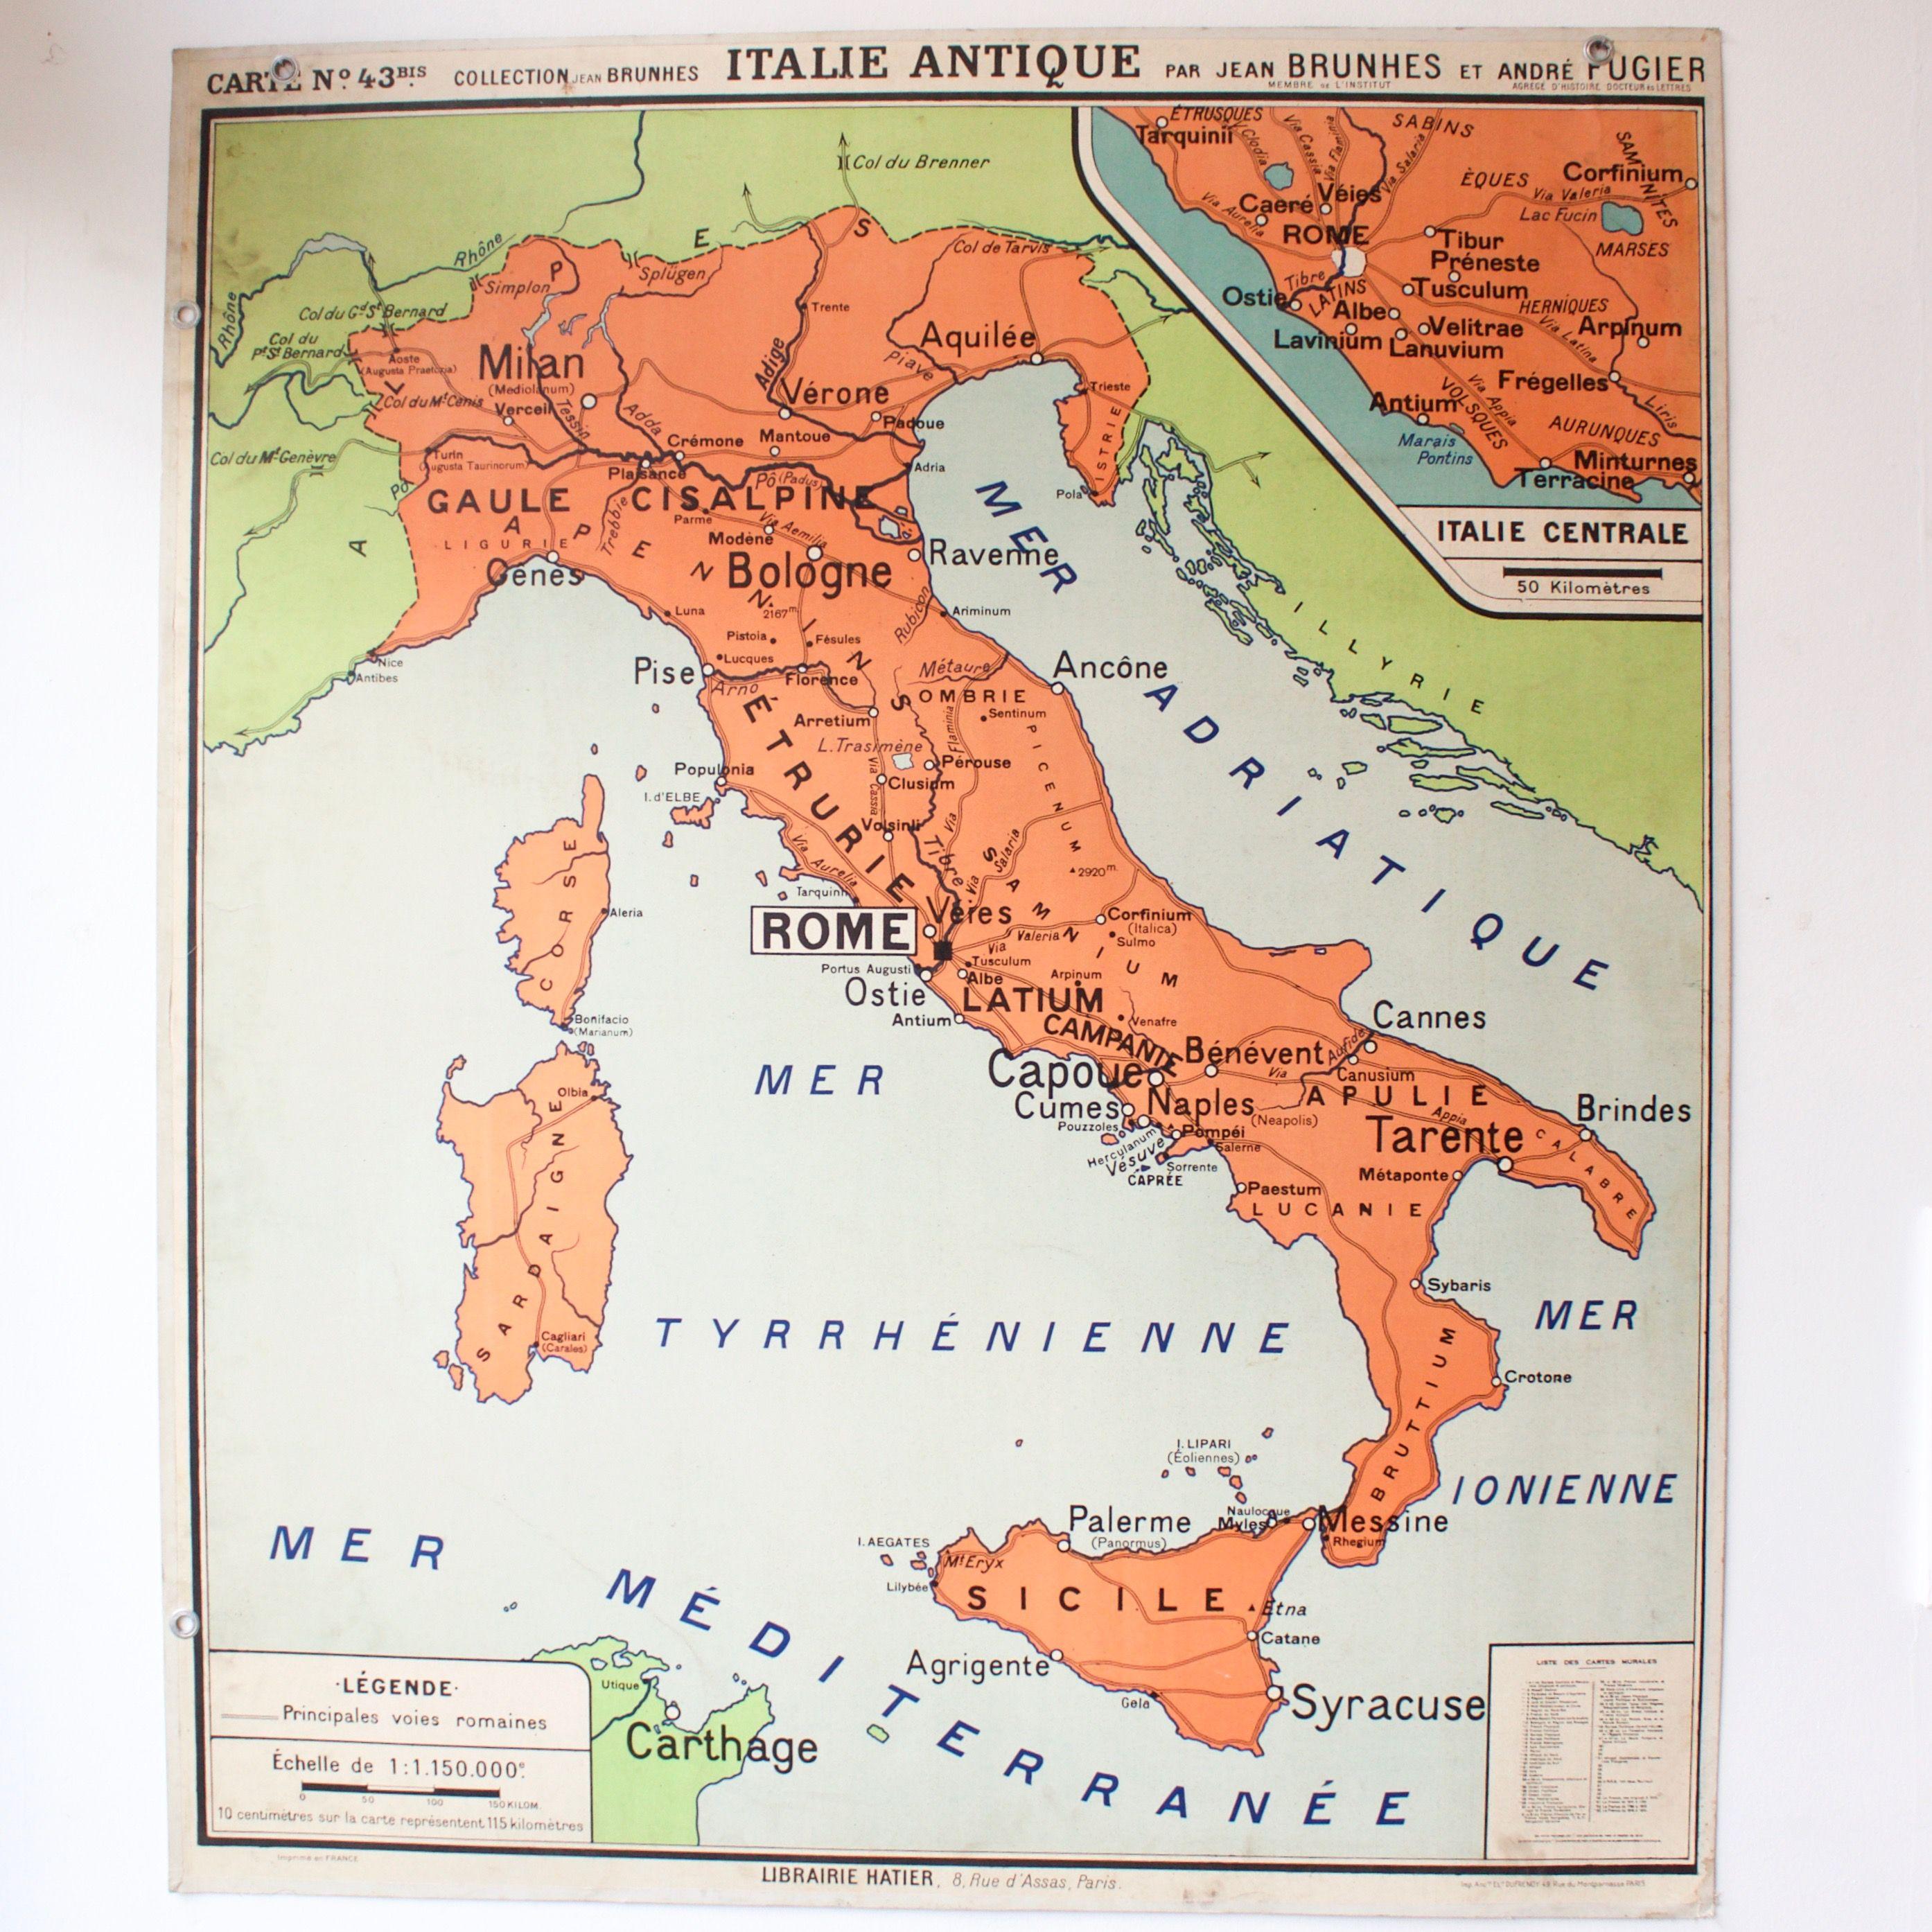 Carte Italie Ancienne.Carte Scolaire Ancienne N43 Italie Antique French Vintage